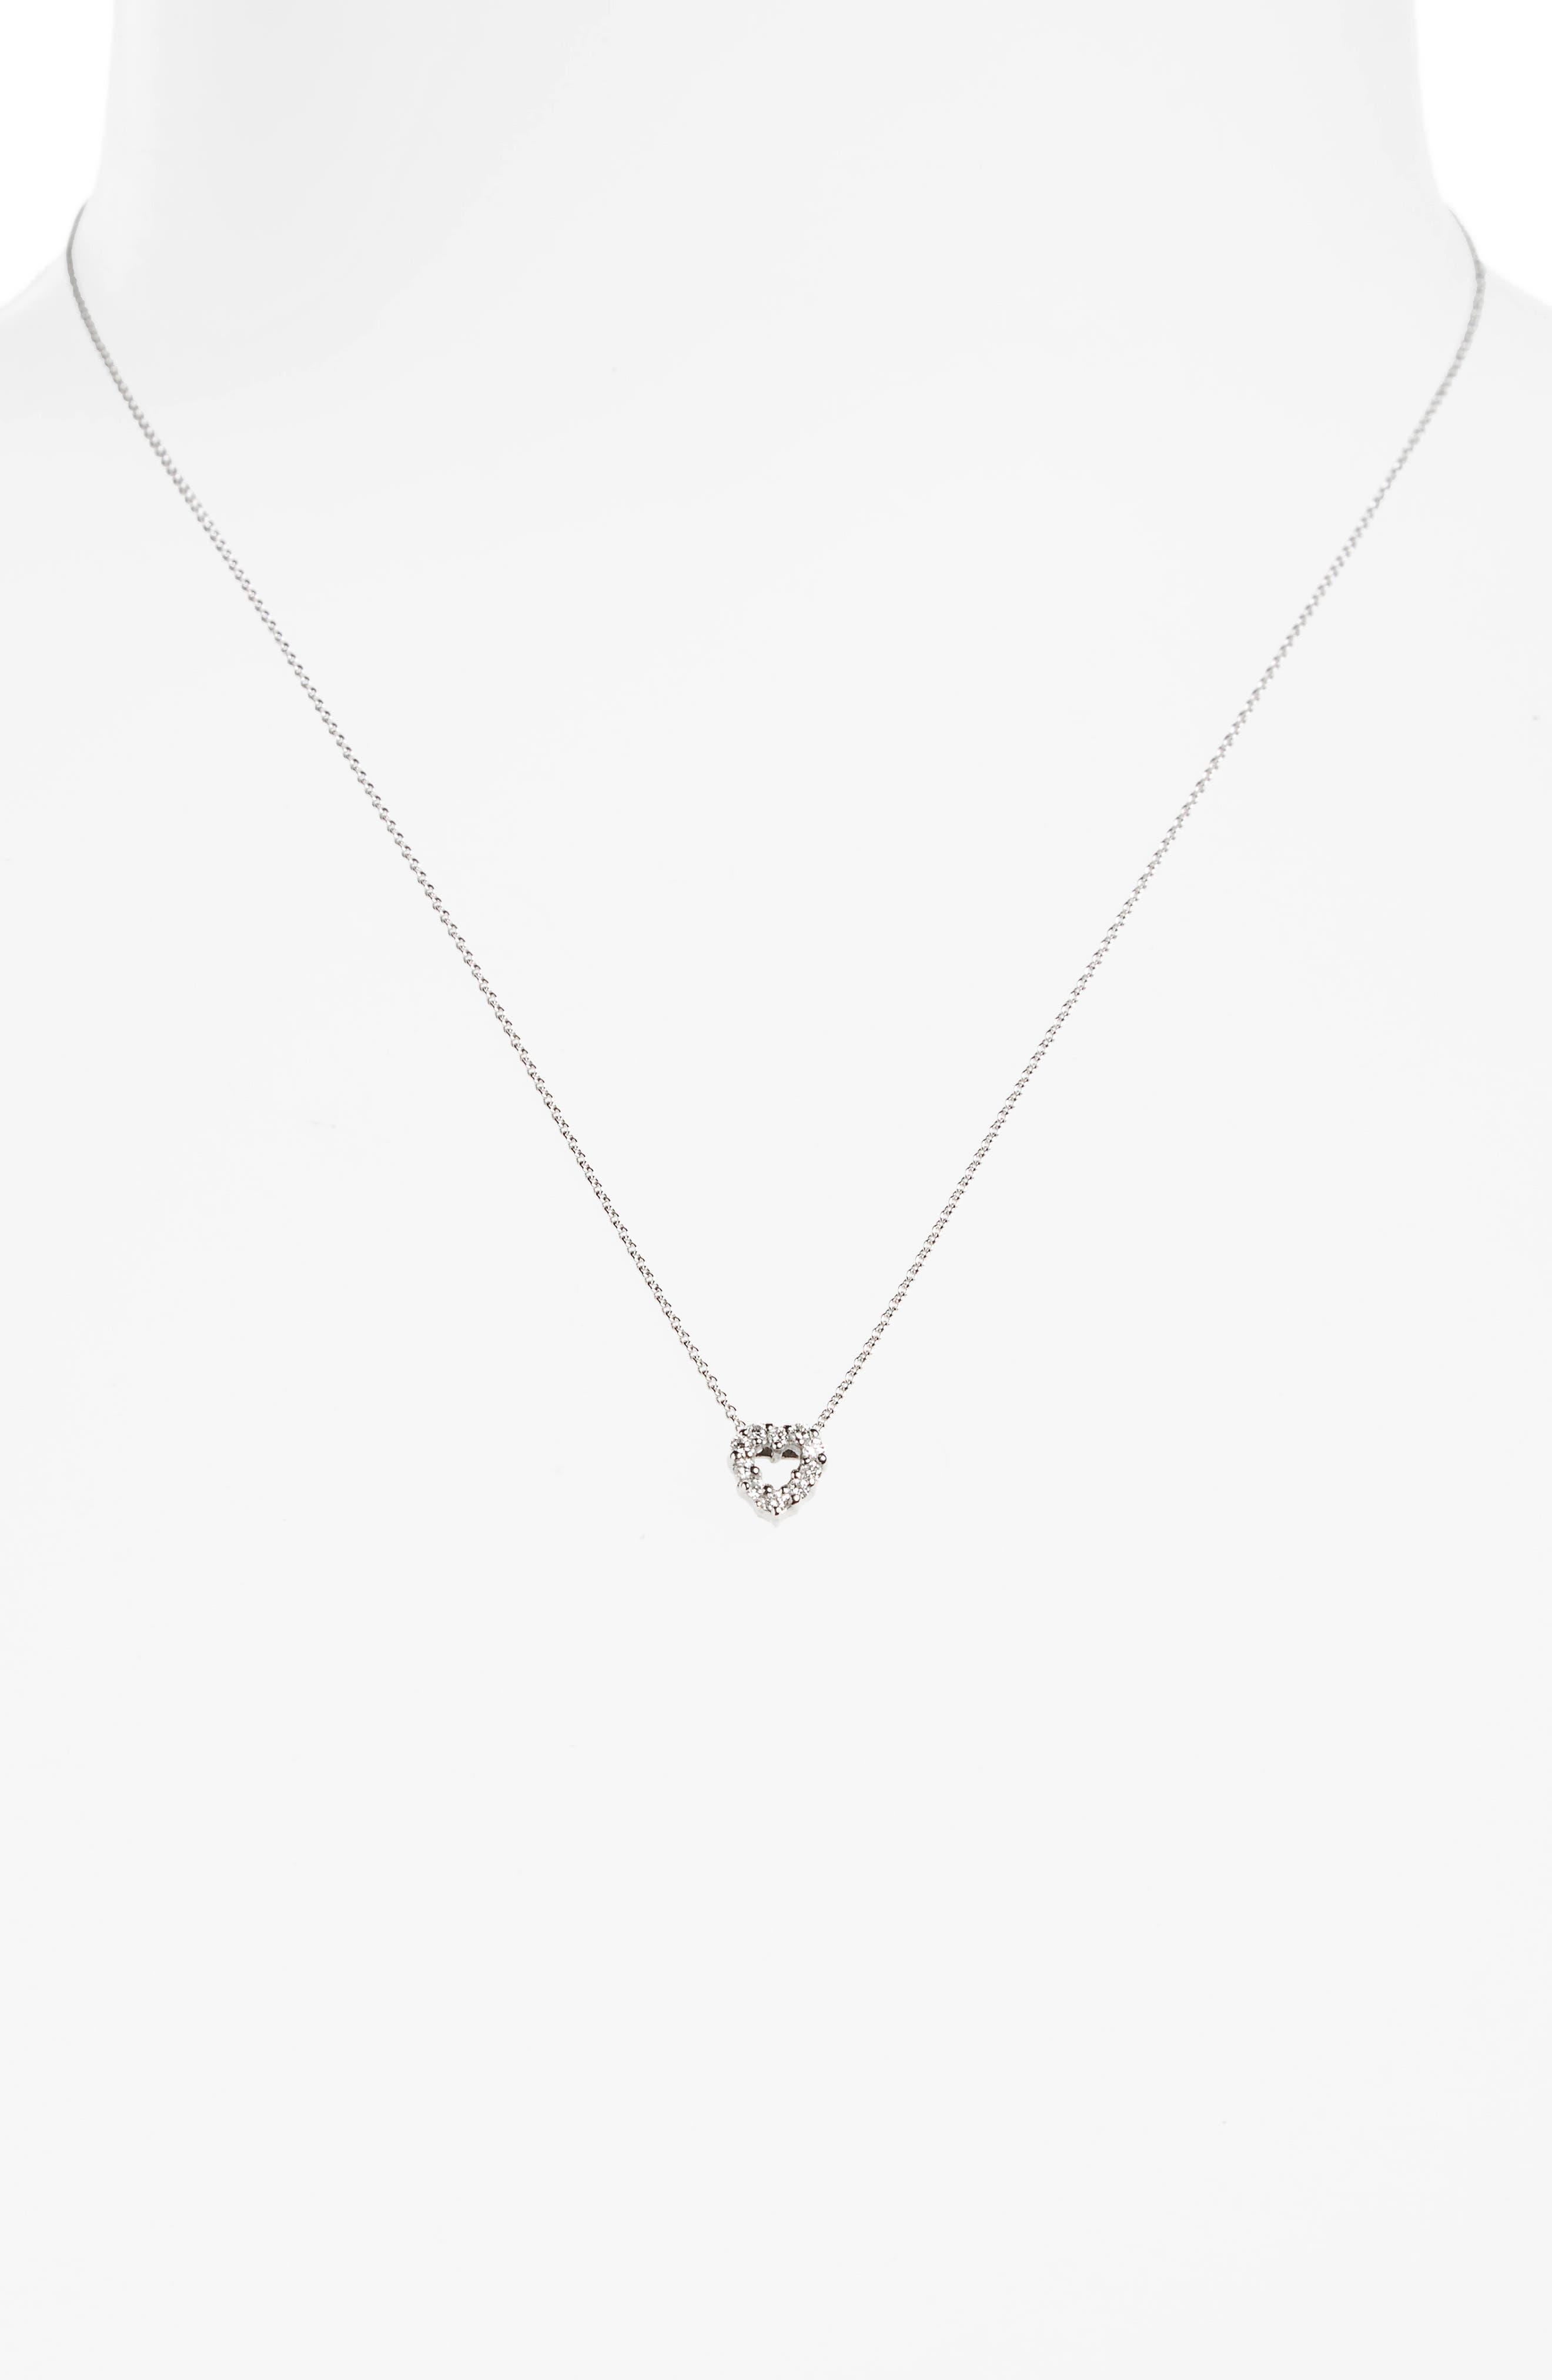 'Tiny Treasures' Diamond Heart Pendant Necklace,                             Alternate thumbnail 3, color,                             WHITE GOLD